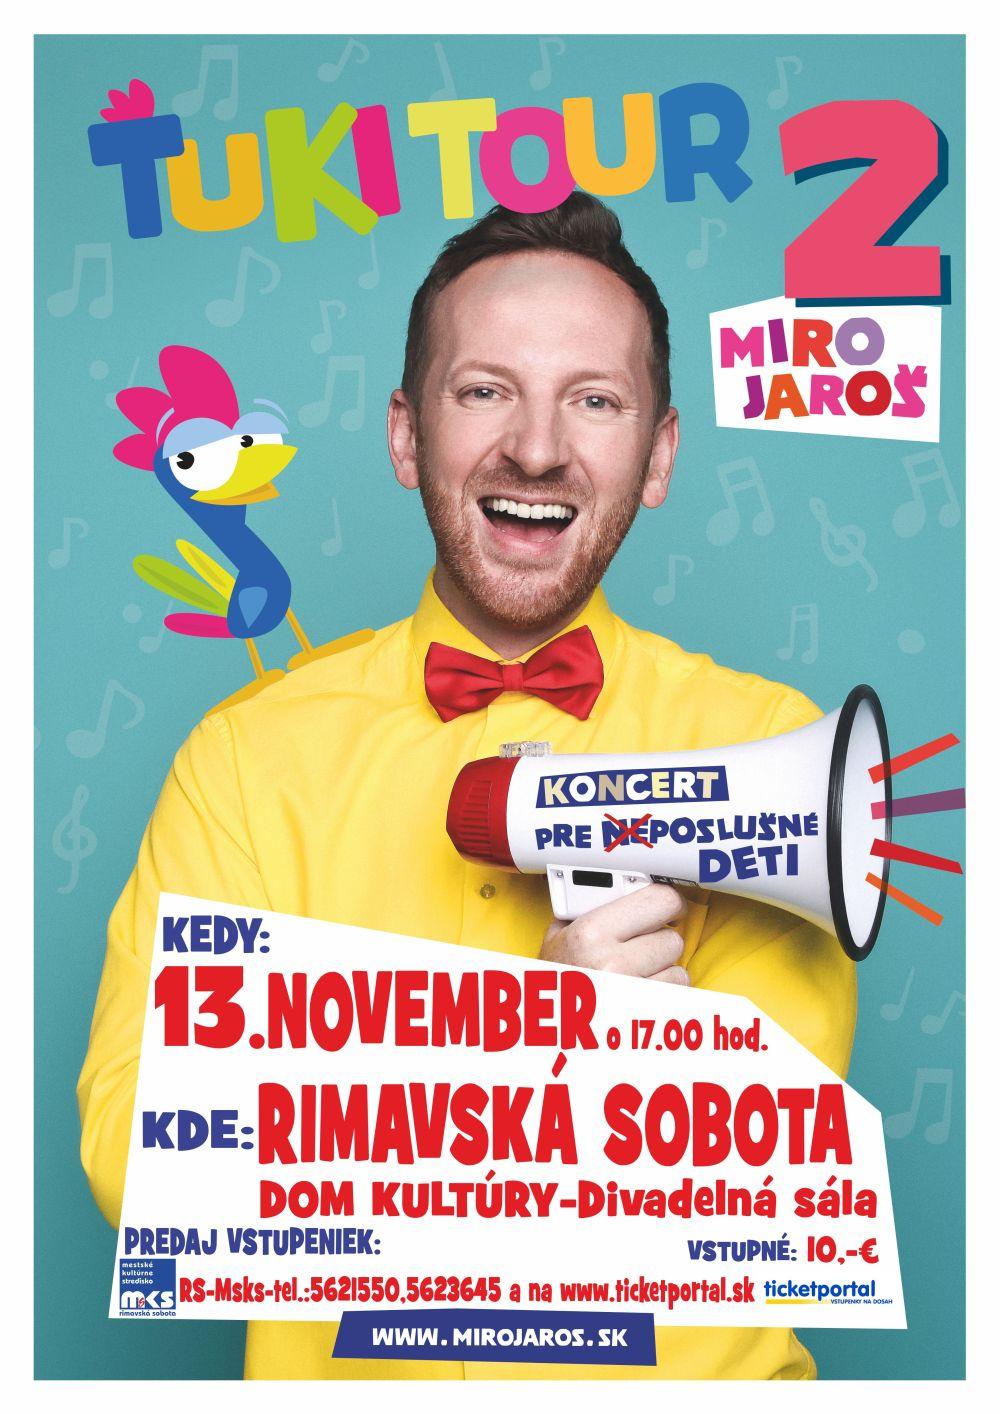 Miro Jaroš – Ťuki tour 2 @ Divadelná sála Domu kultúry Rimavská Sobota | Slovensko